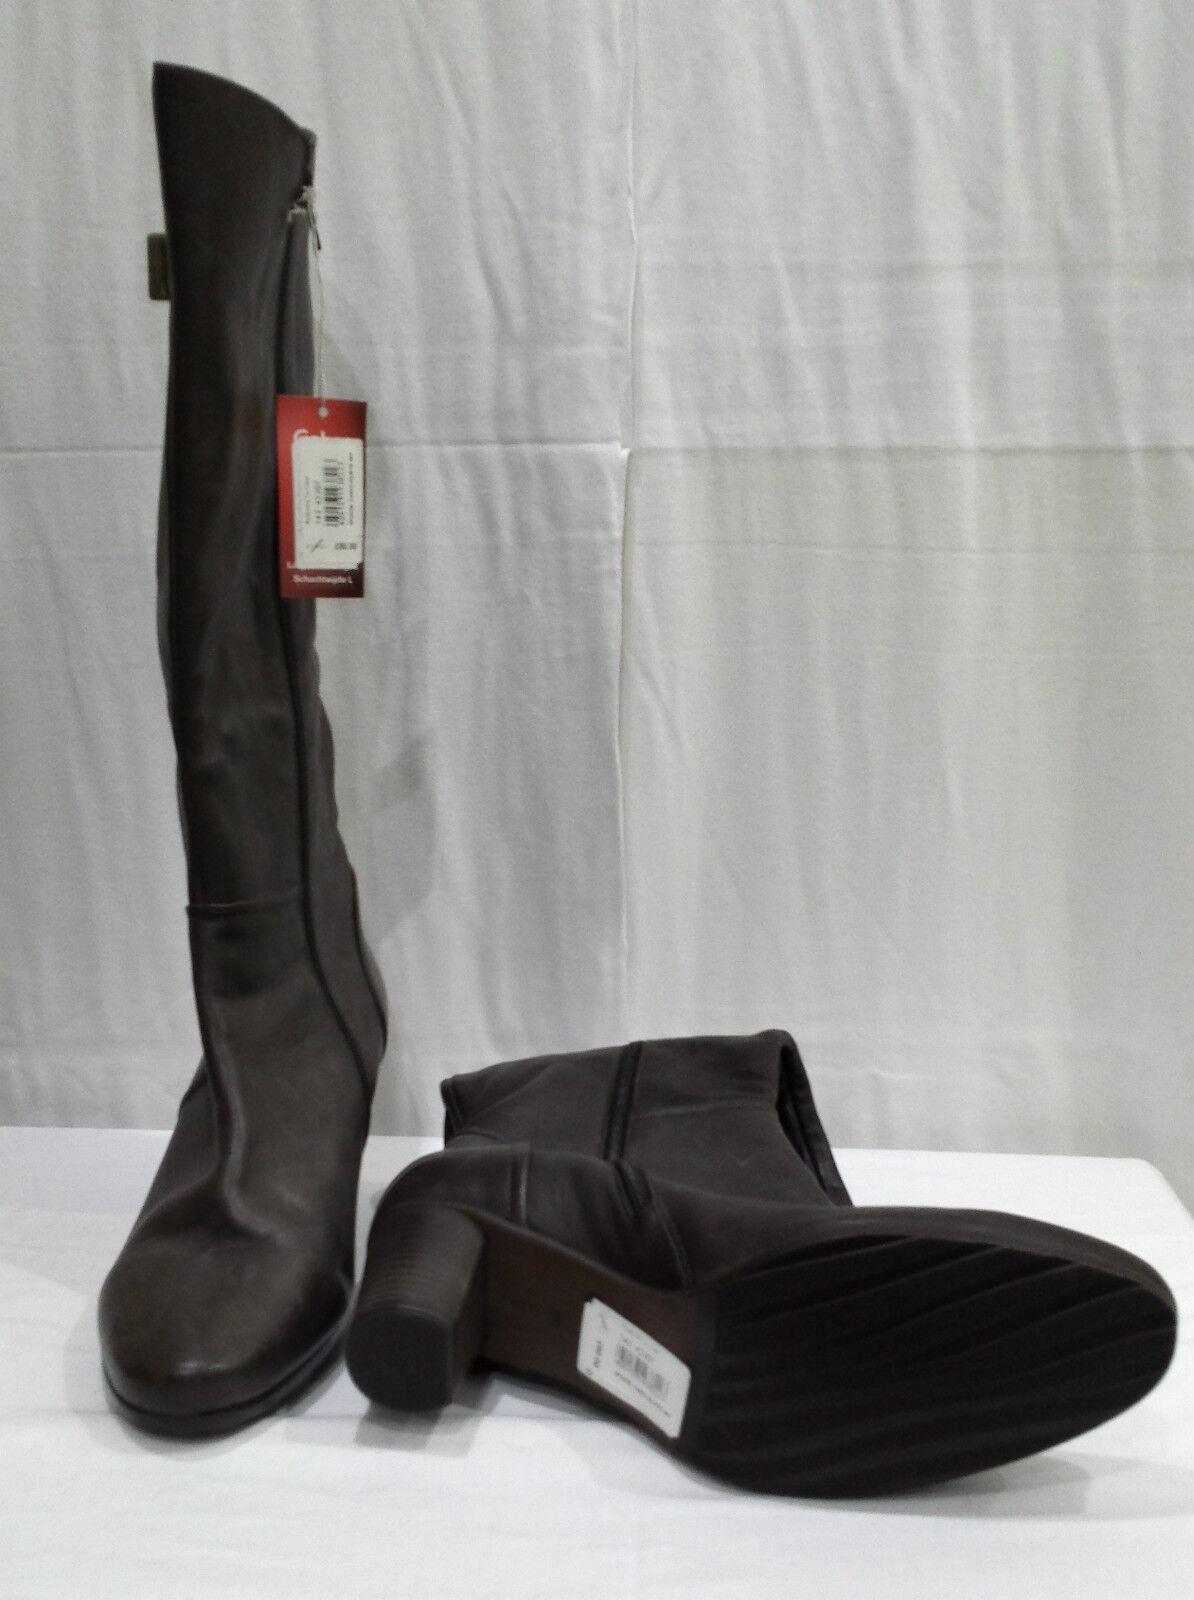 GABOR - SPOKE CHOCOLATE BOOT - SIZE 6 1/2 BB184 - 20,000+ F/BACK  BB184 1/2 6c84ff